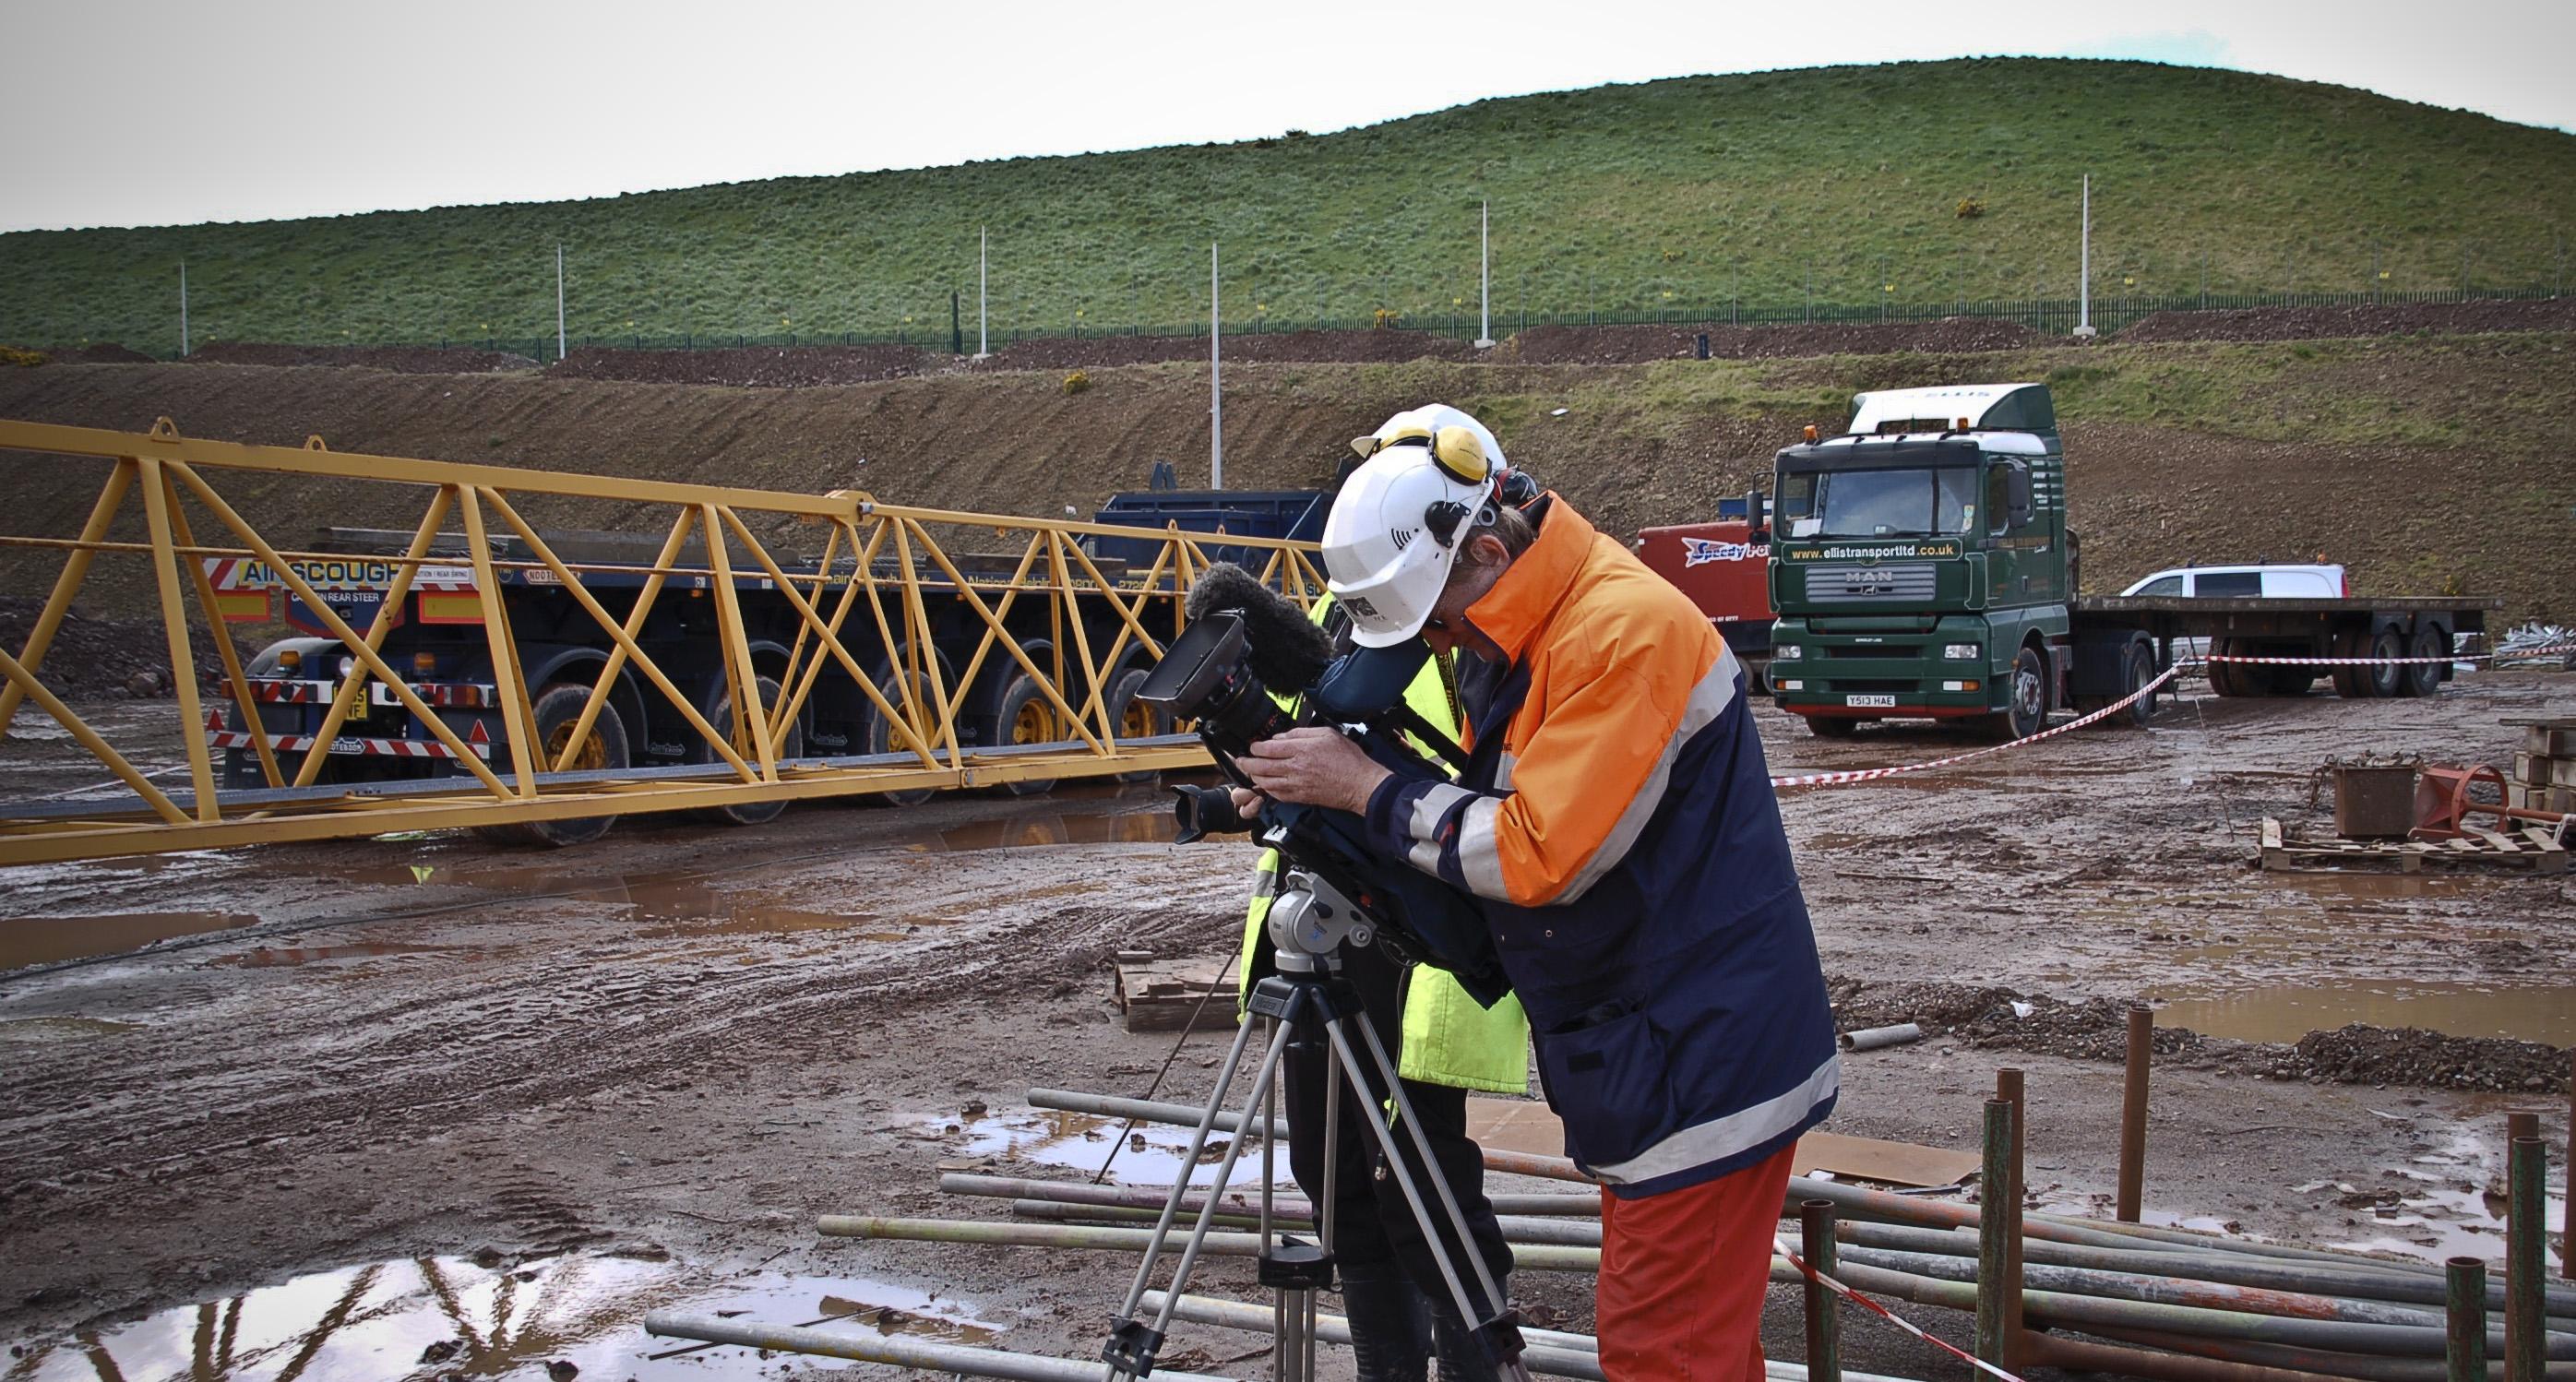 Whessoe - Volker Stevin LNG project